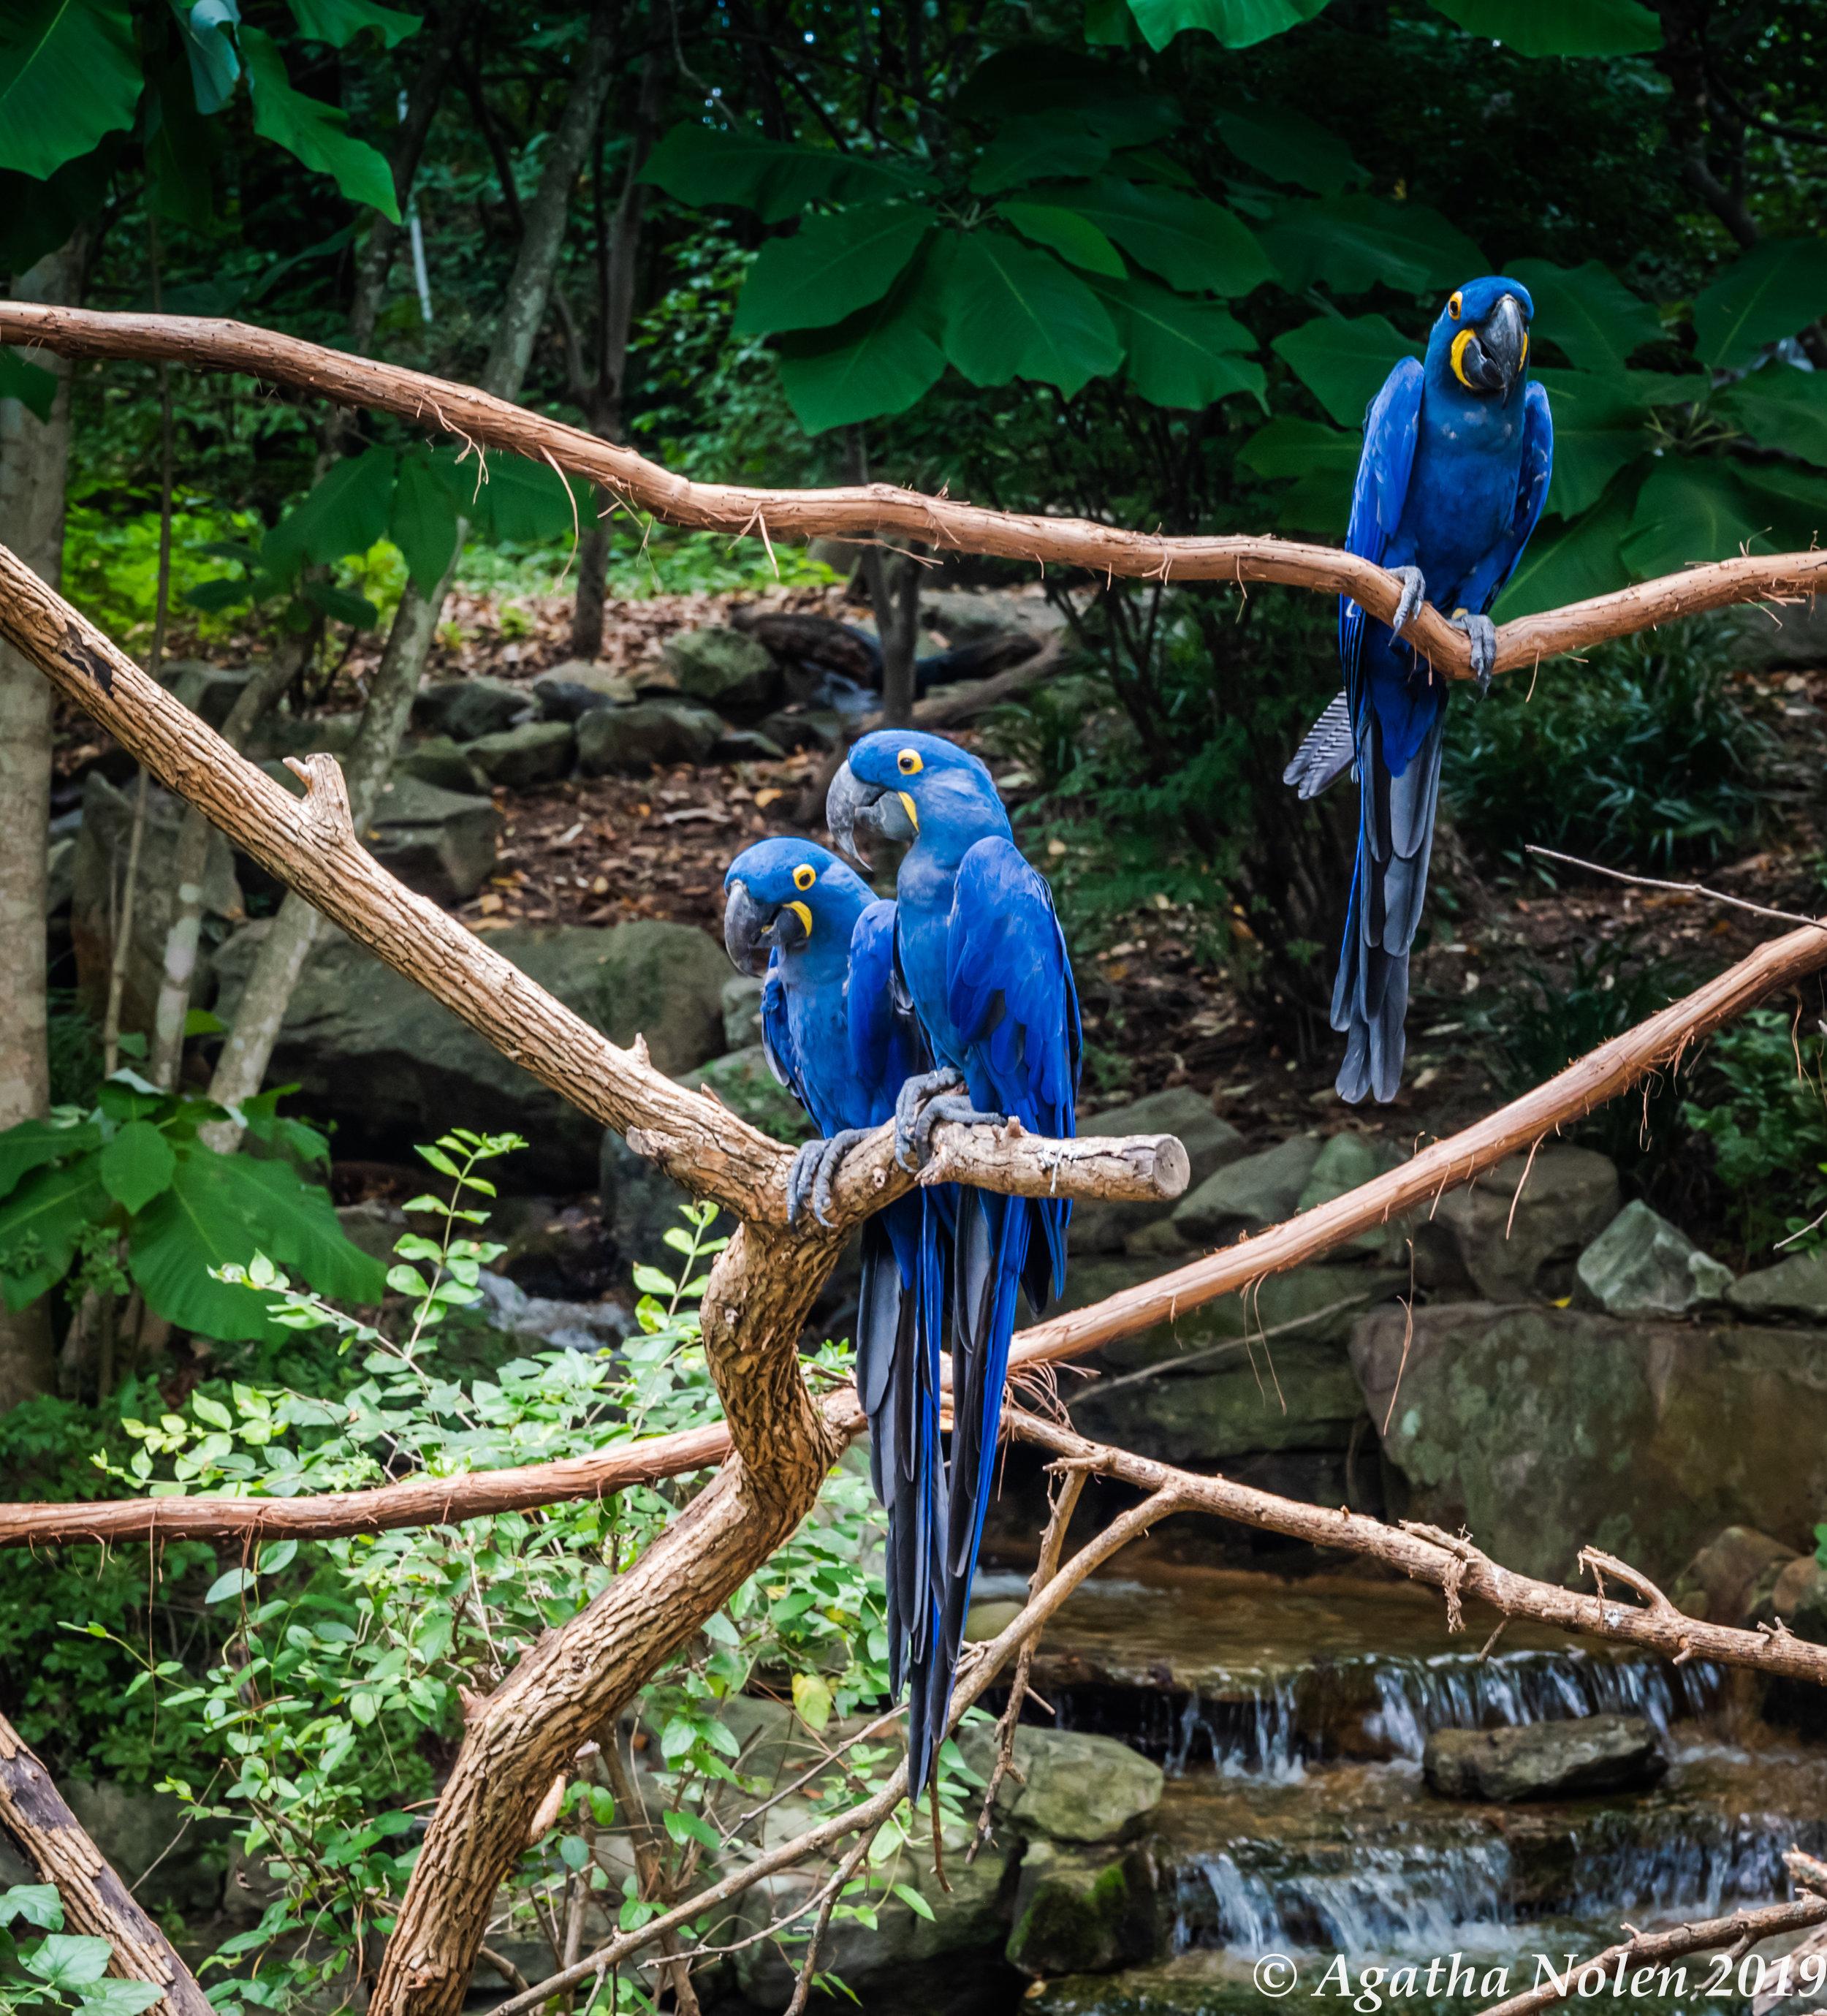 Nashville Zoo Blue Bird Sept 1 2019.jpg